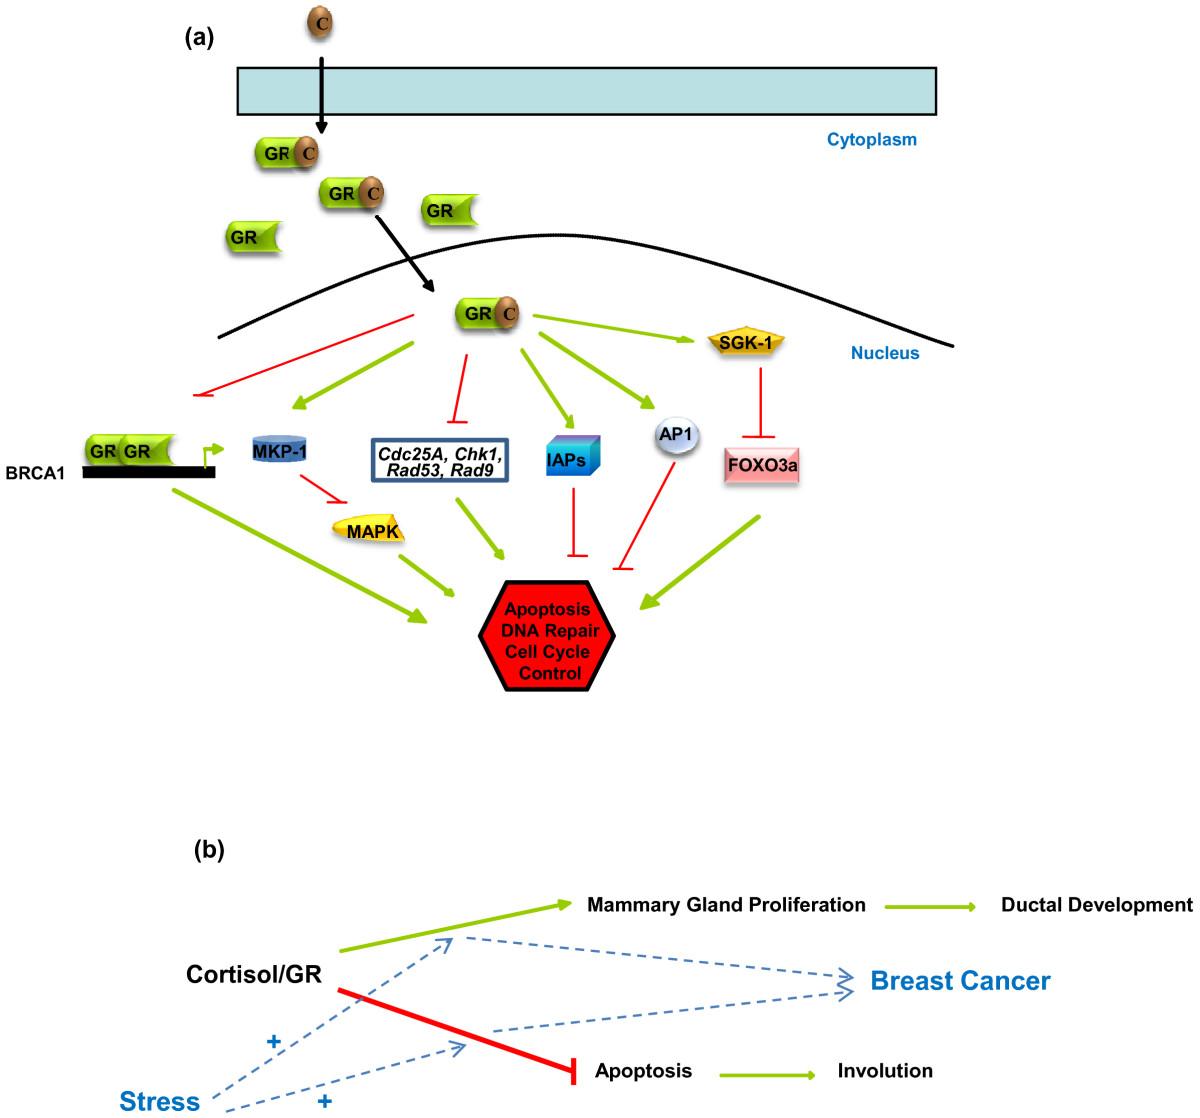 https://static-content.springer.com/image/art%3A10.1186%2Fbcr2836/MediaObjects/13058_2011_2667_Fig2_HTML.jpg